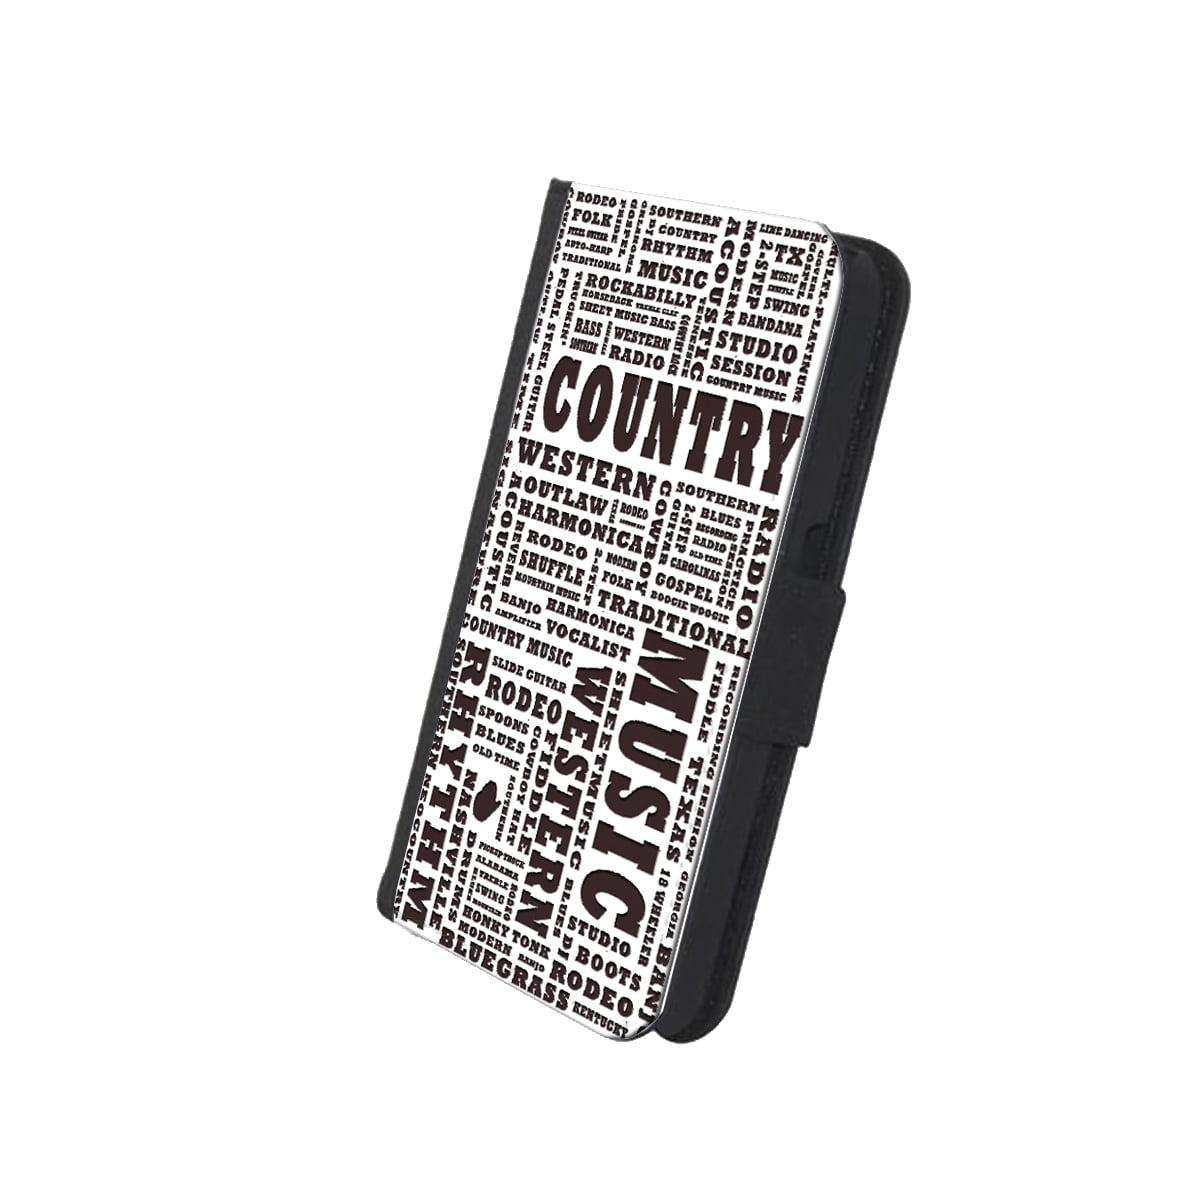 KuzmarK™ Samsung Galaxy S6 Wallet Case - Country Music